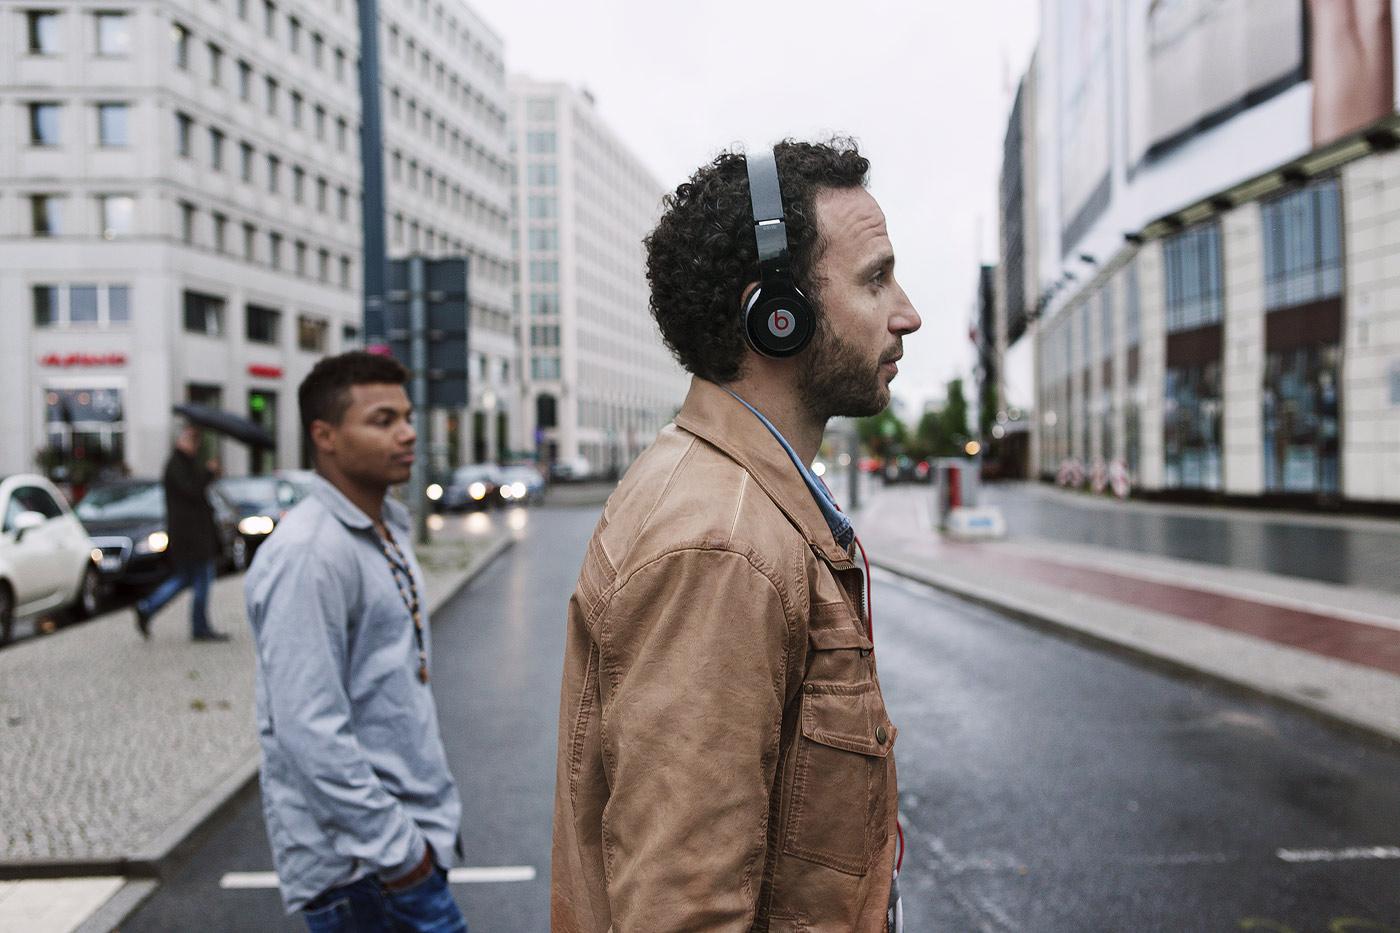 mann-musik-hoeren-urban-advertising